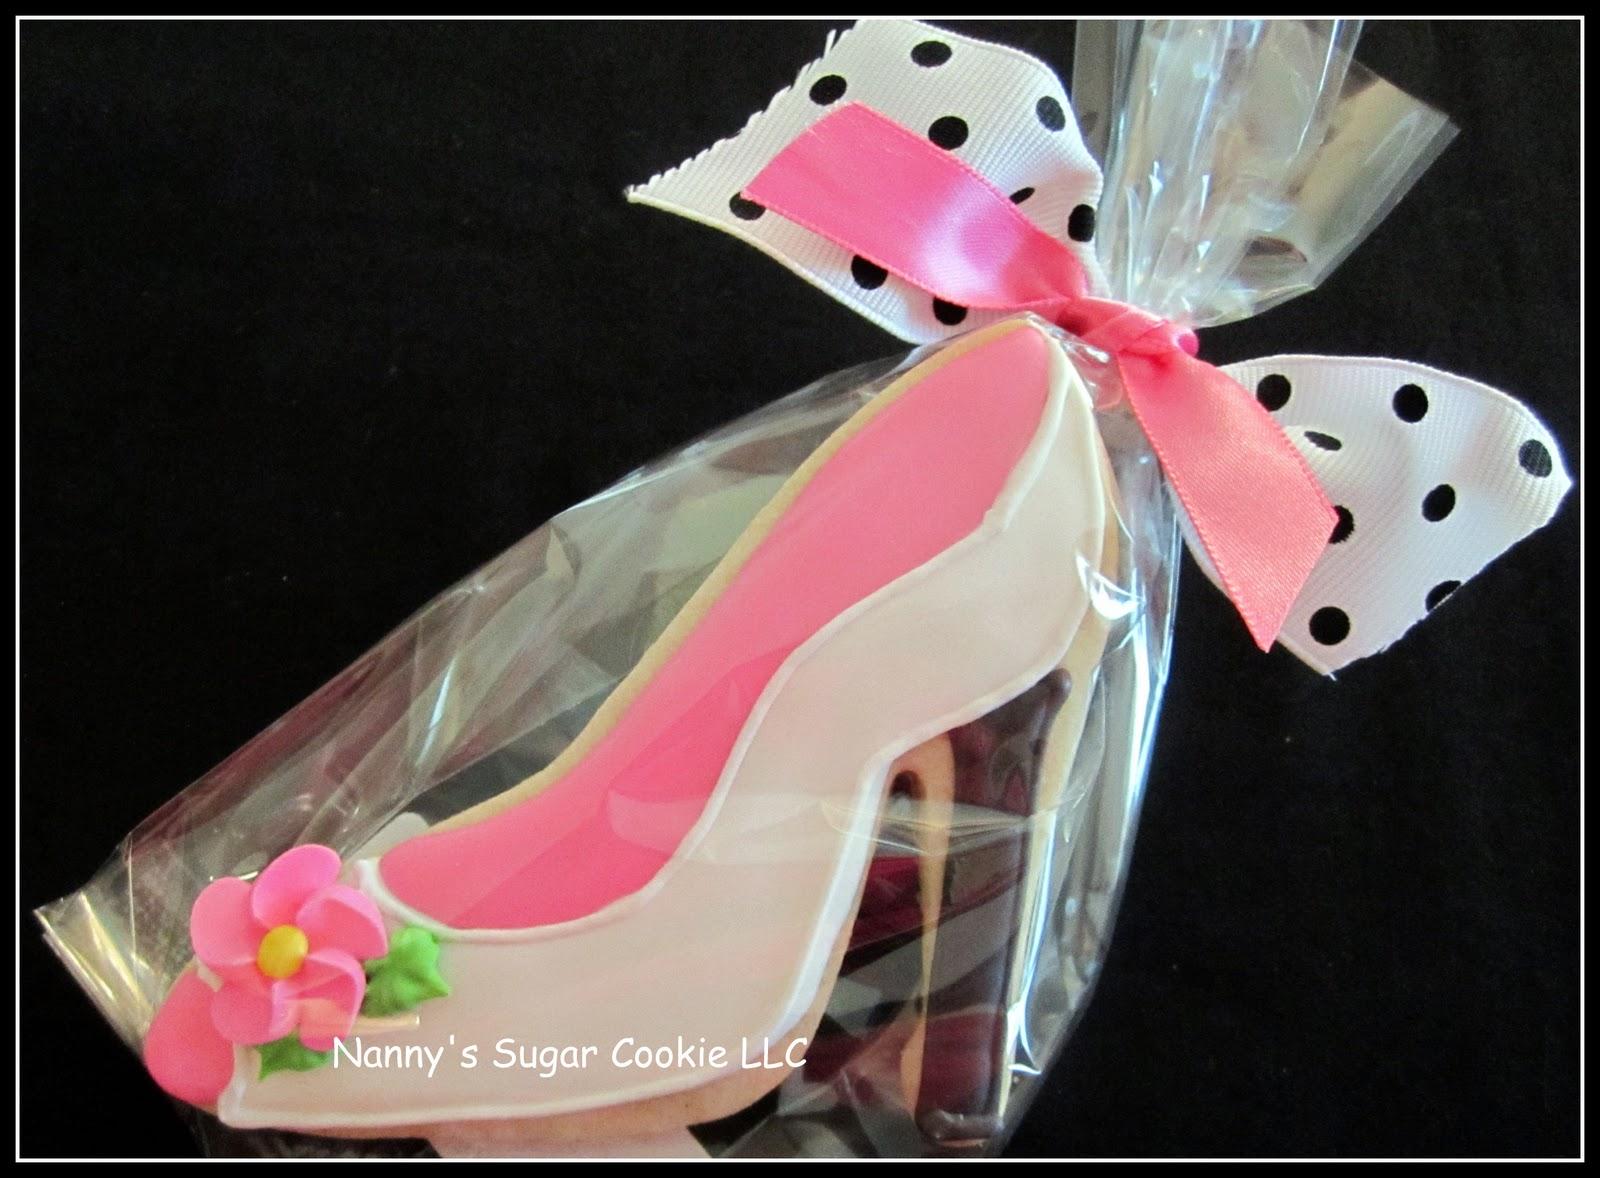 Nanny\'s Sugar Cookies LLC: January 2012